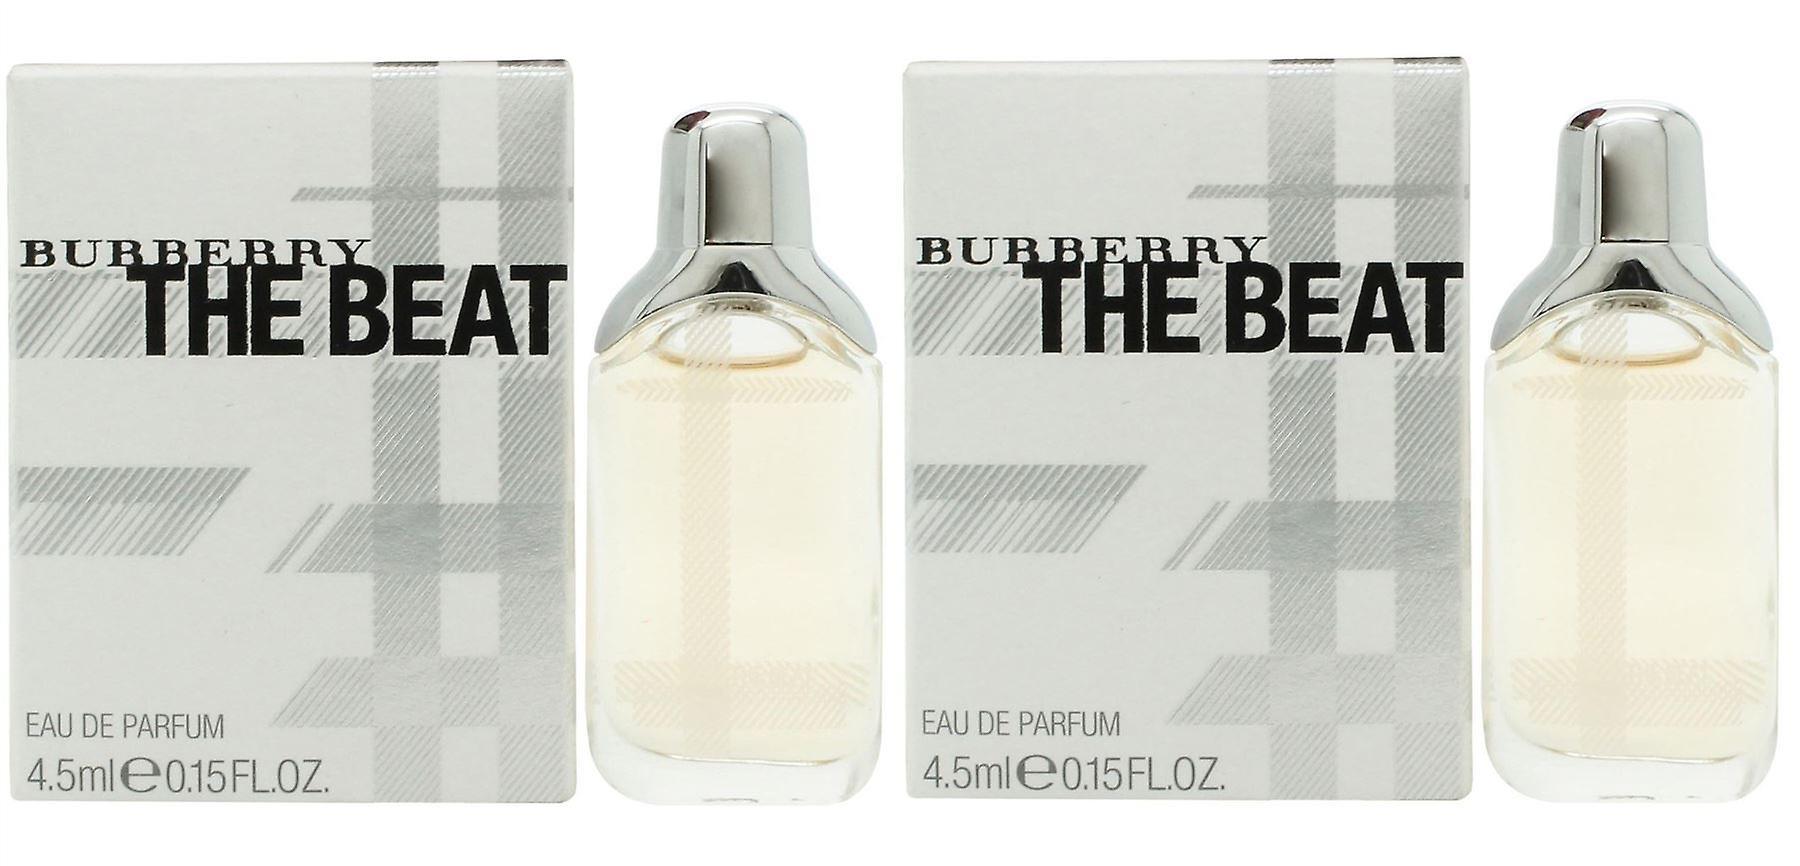 Twin Parfum Pack L'edp Ml Womens 5 4 Mini Burberry Beat Femmes EIW9YD2H